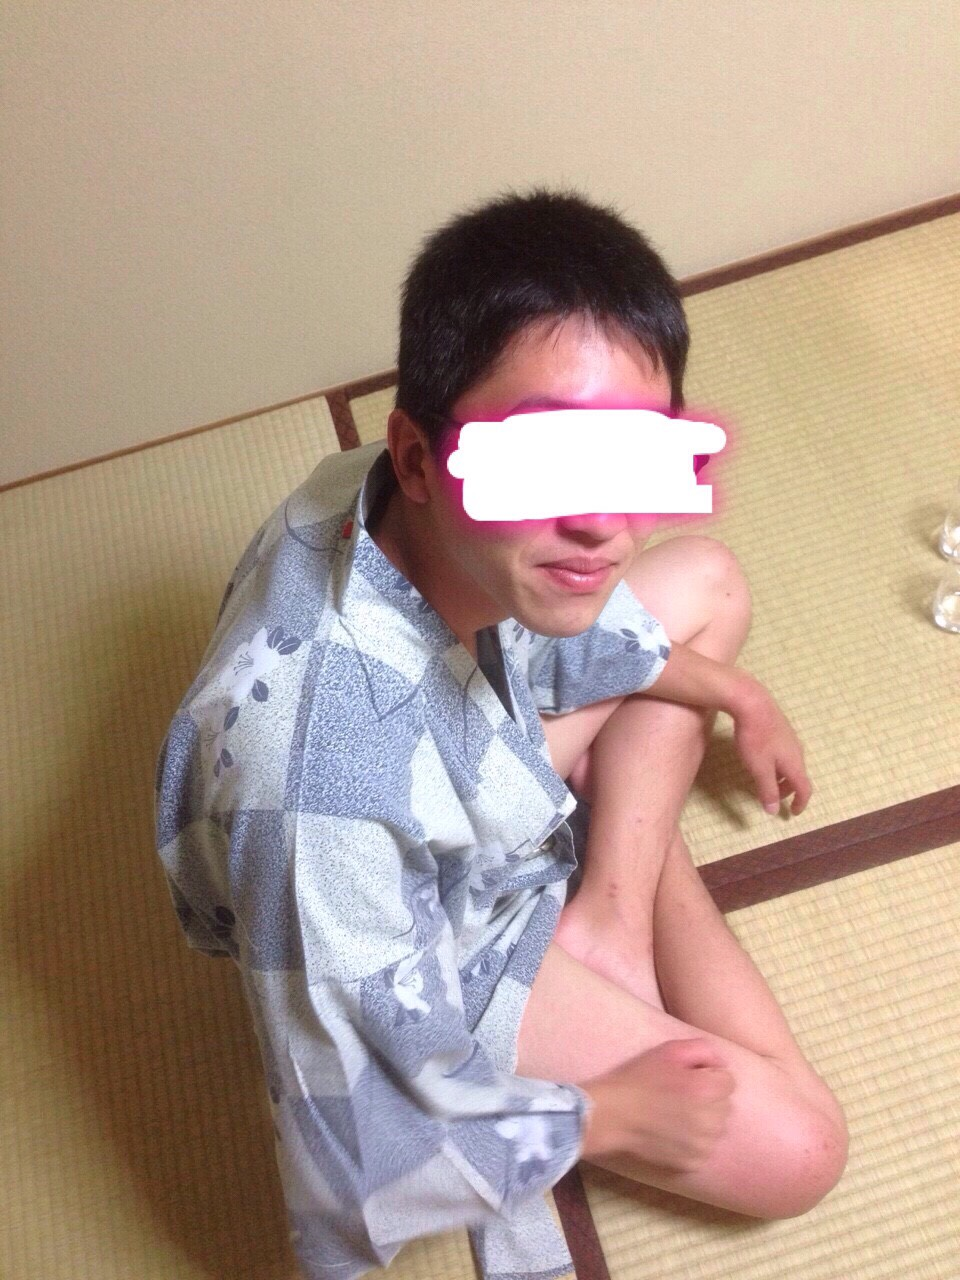 S__36061186.jpg